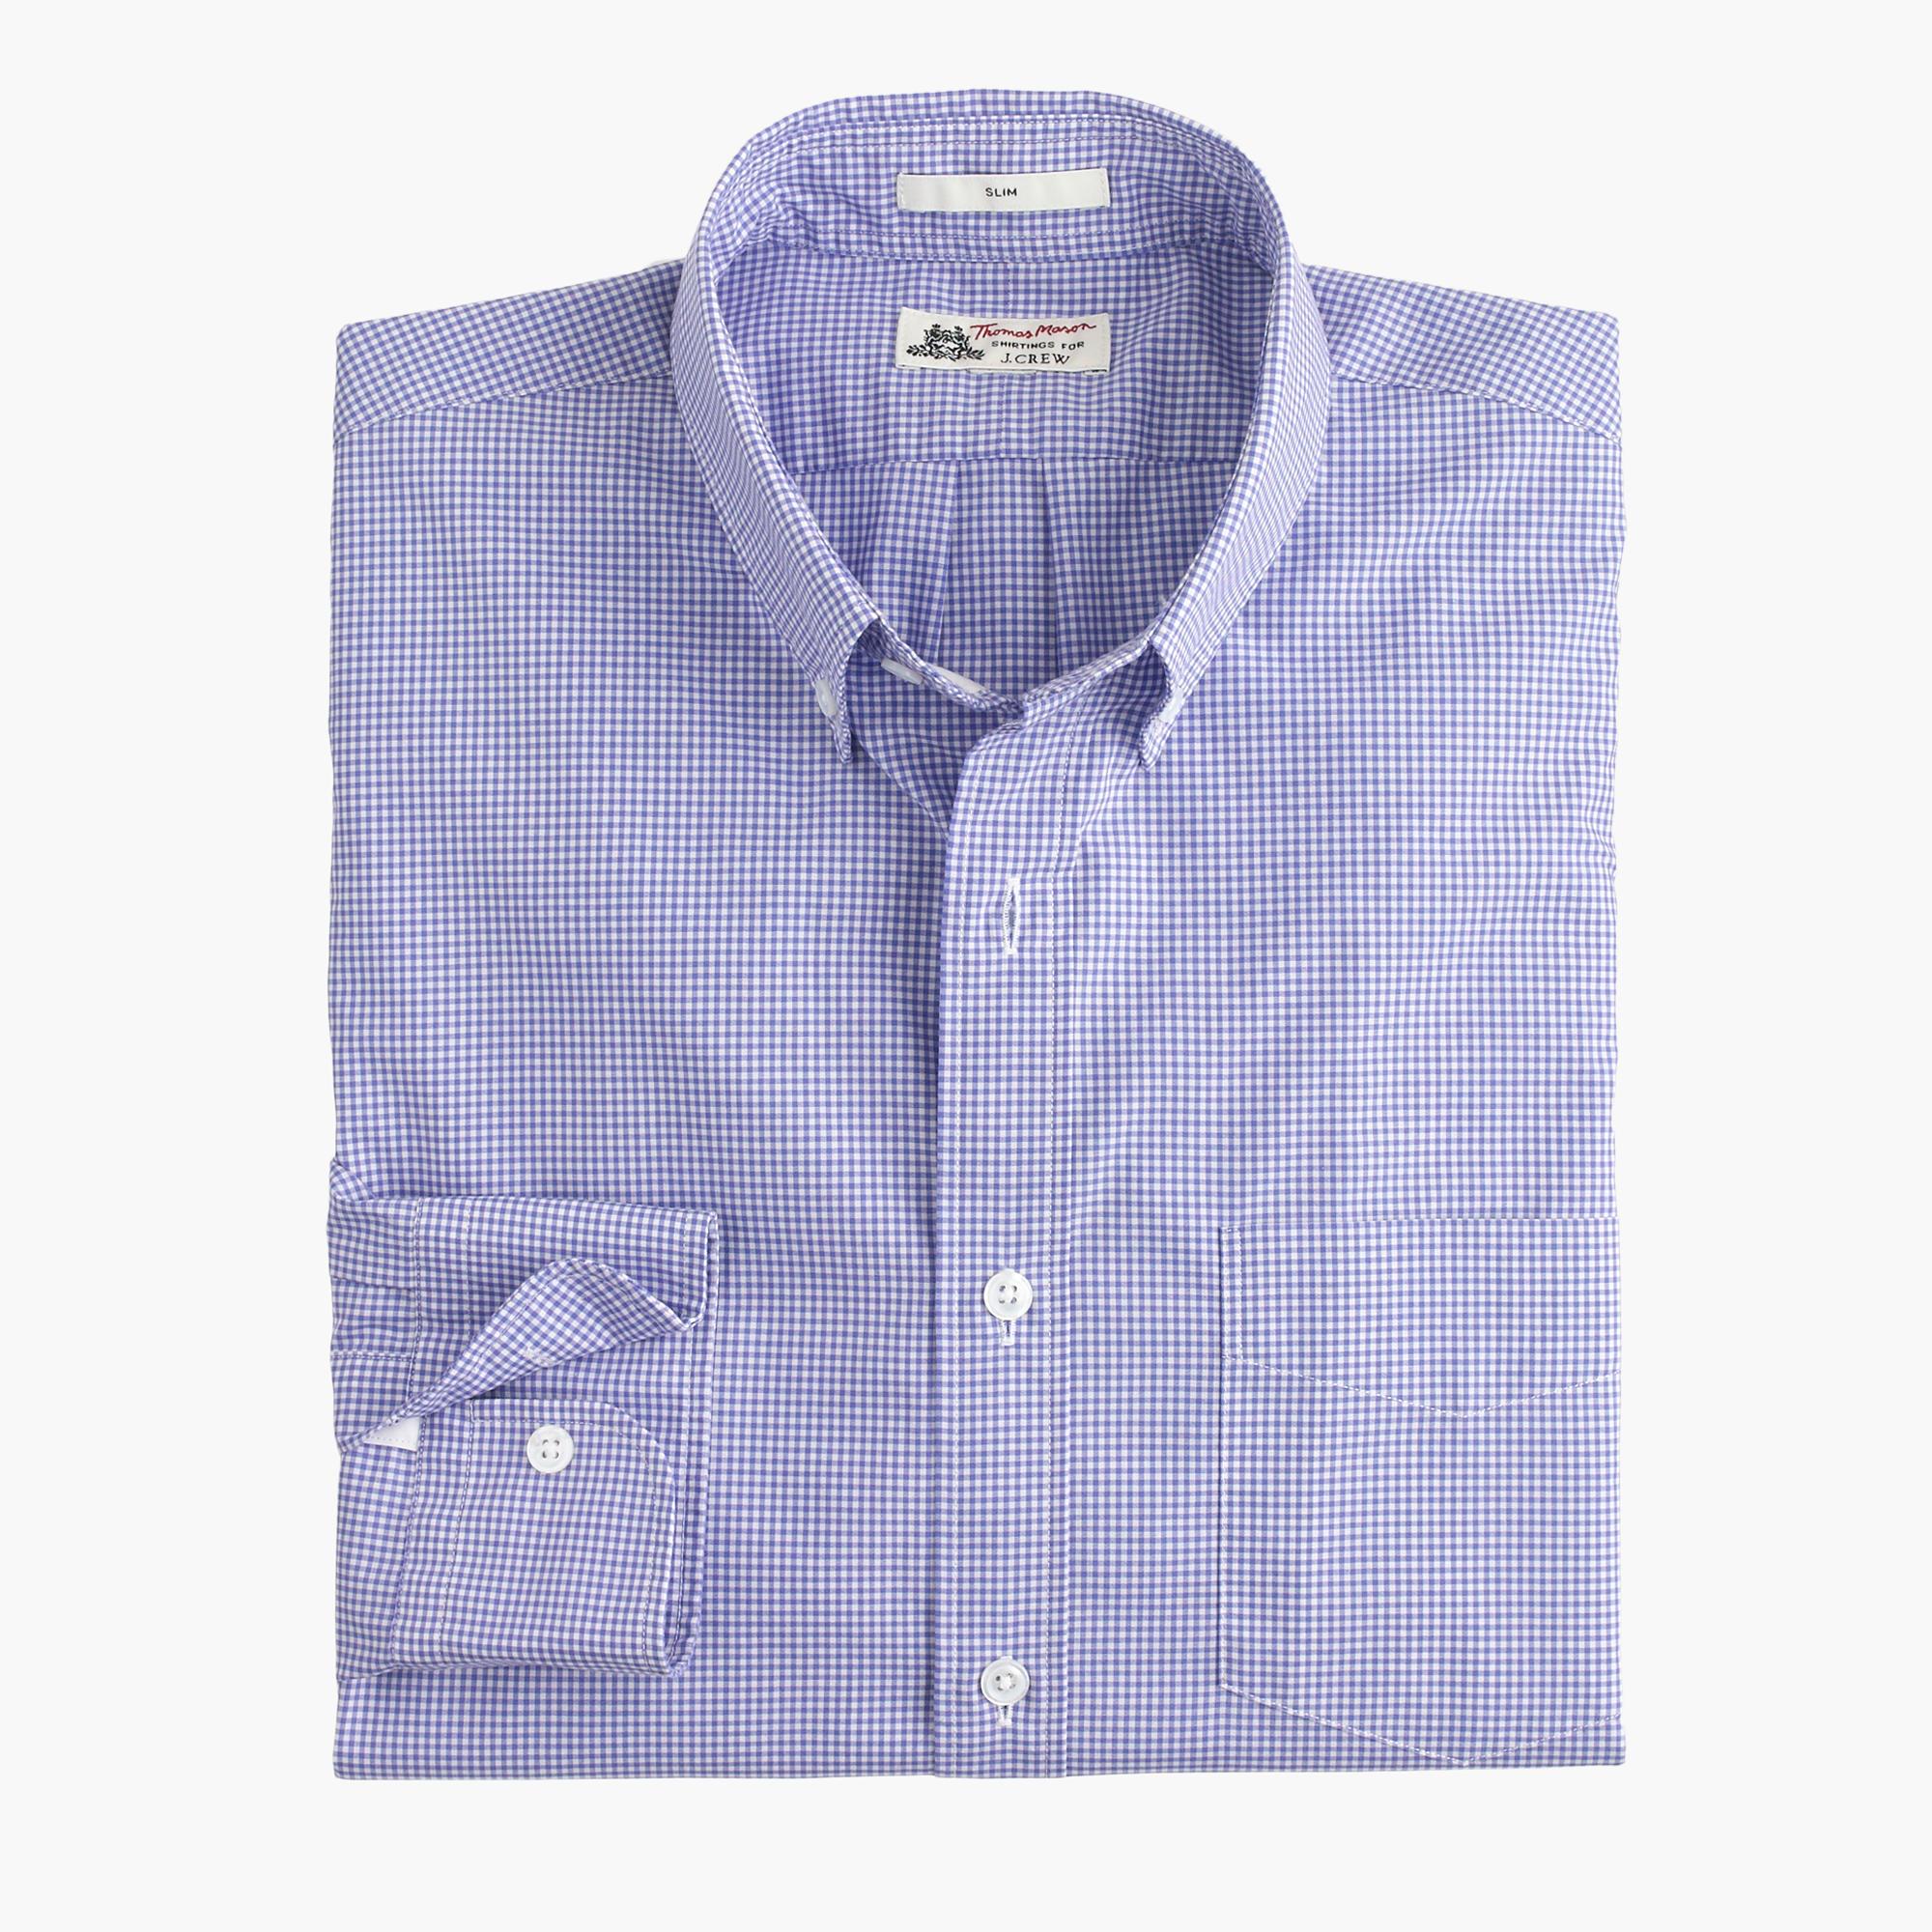 Slim thomas mason for j crew shirt in baltic mini gingham for Mason s men s shirts